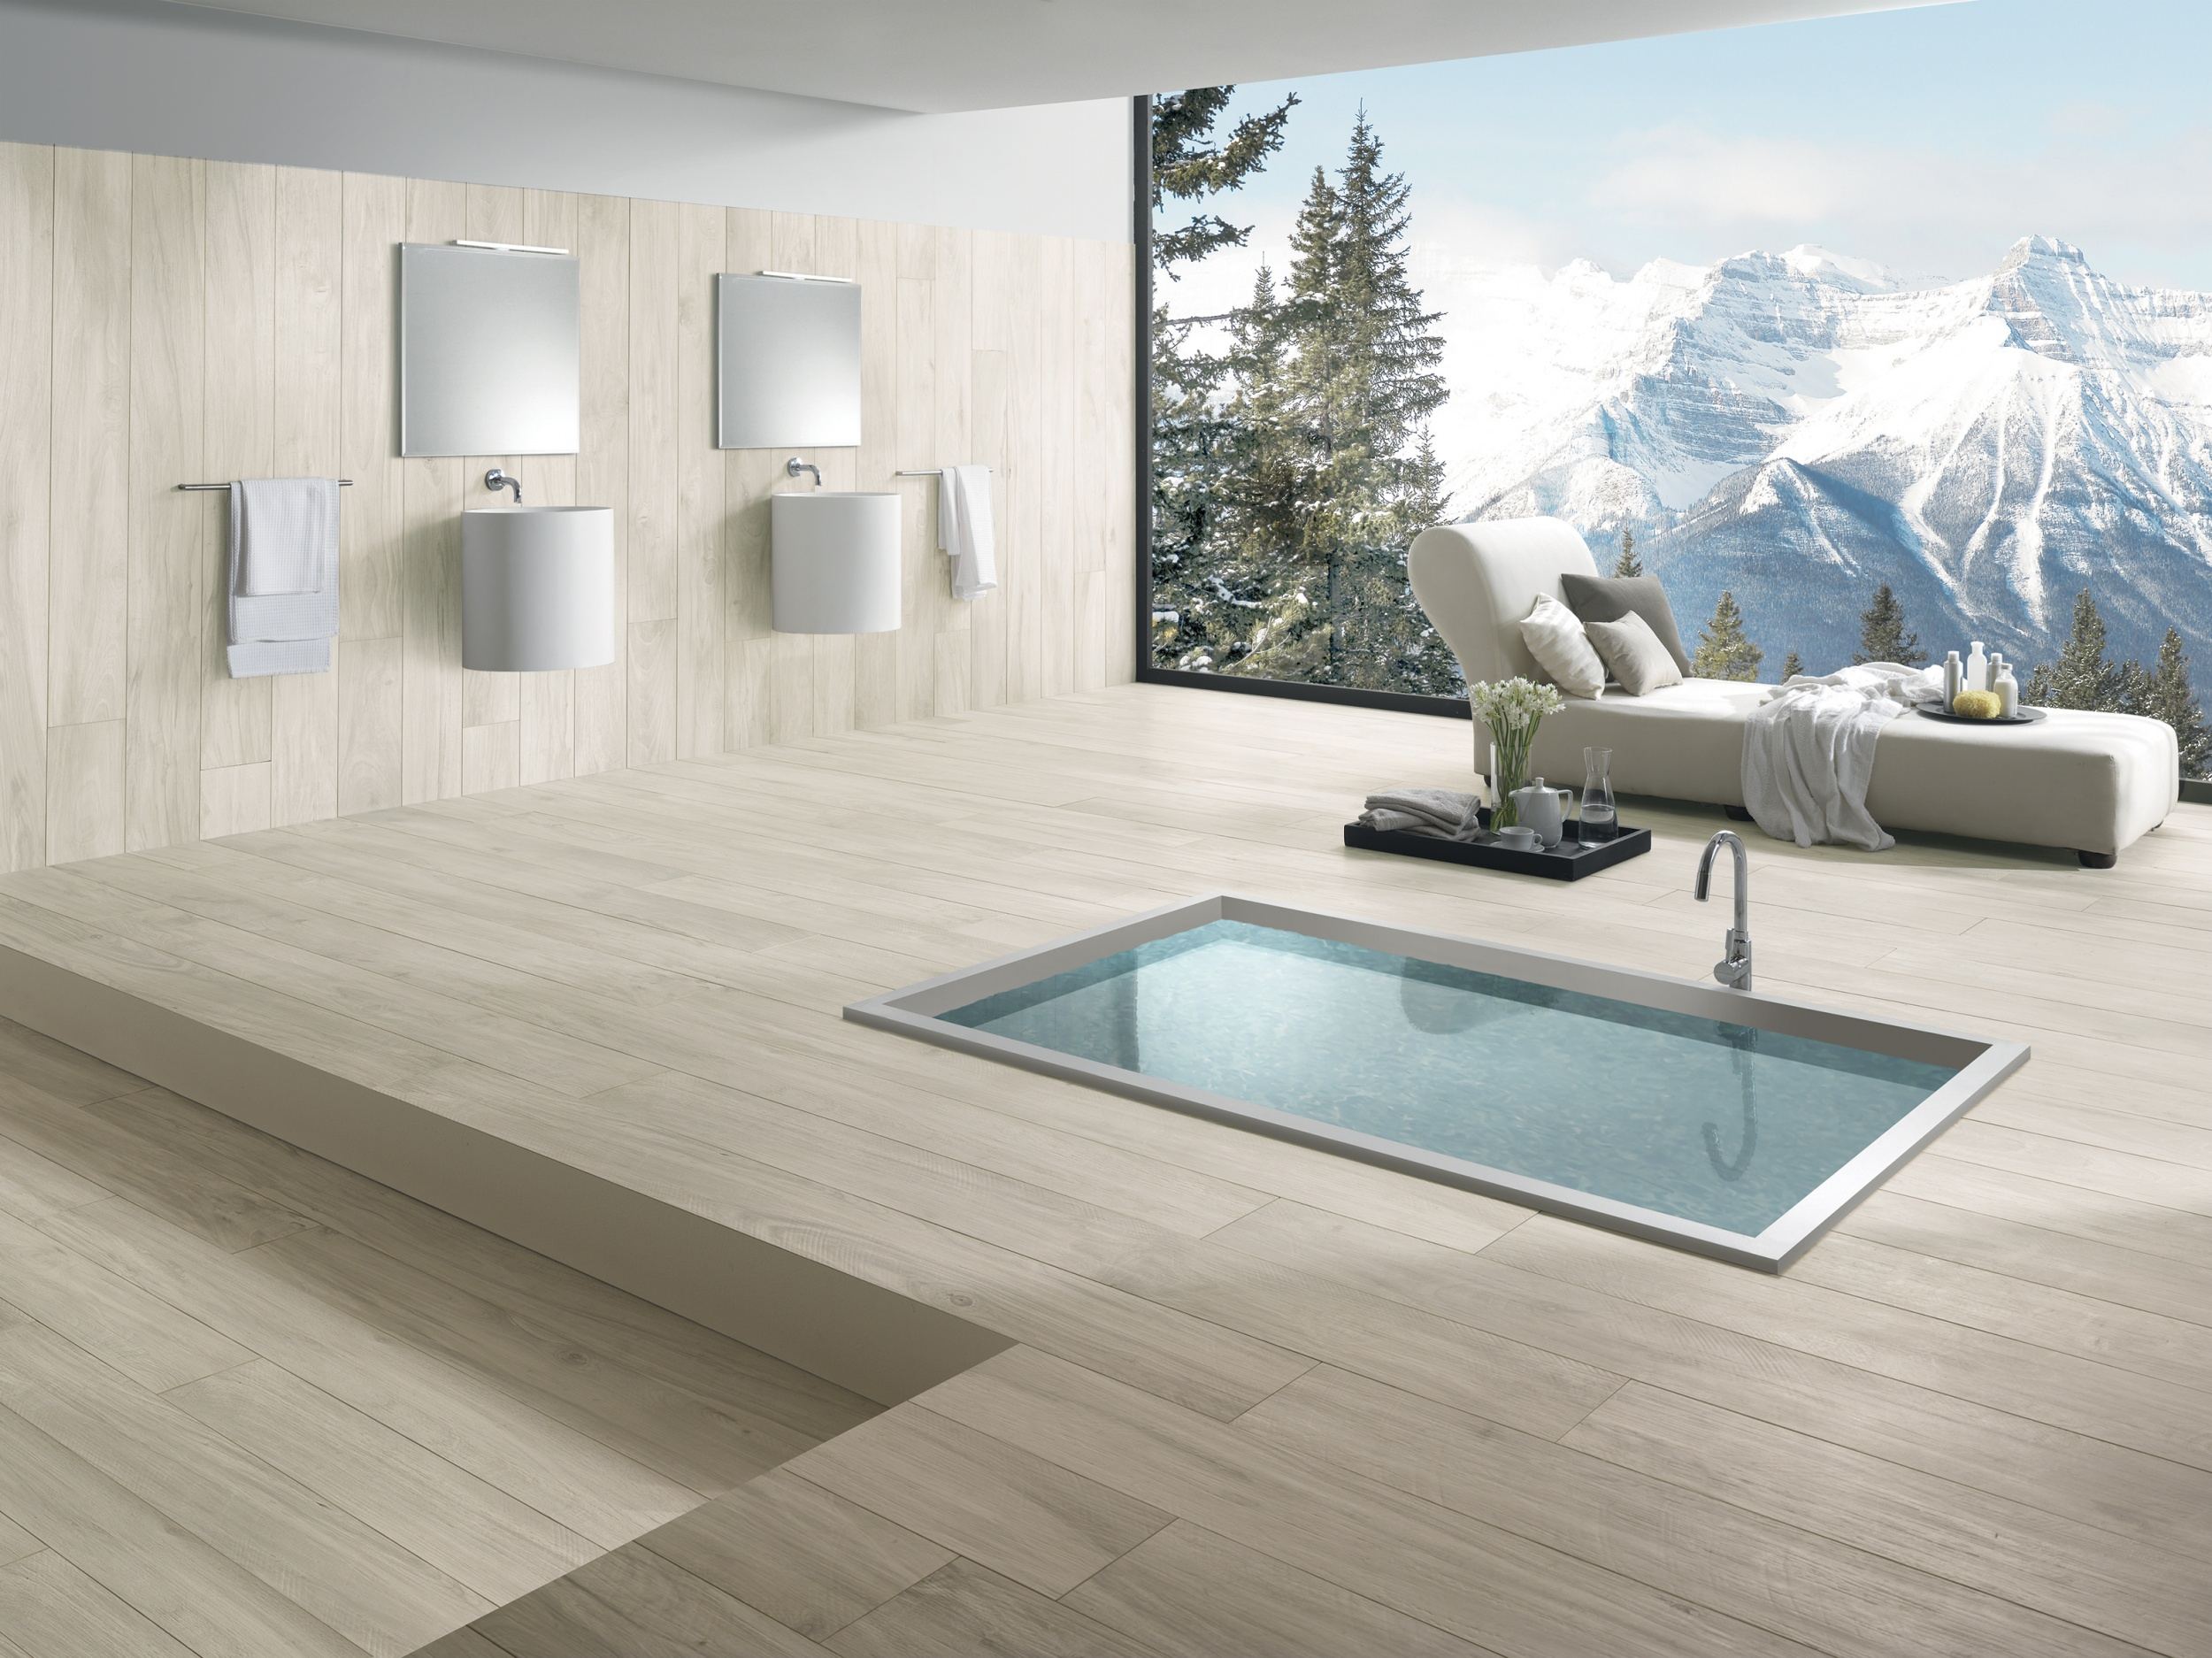 porcelain tile images: Essenza range high quality photo